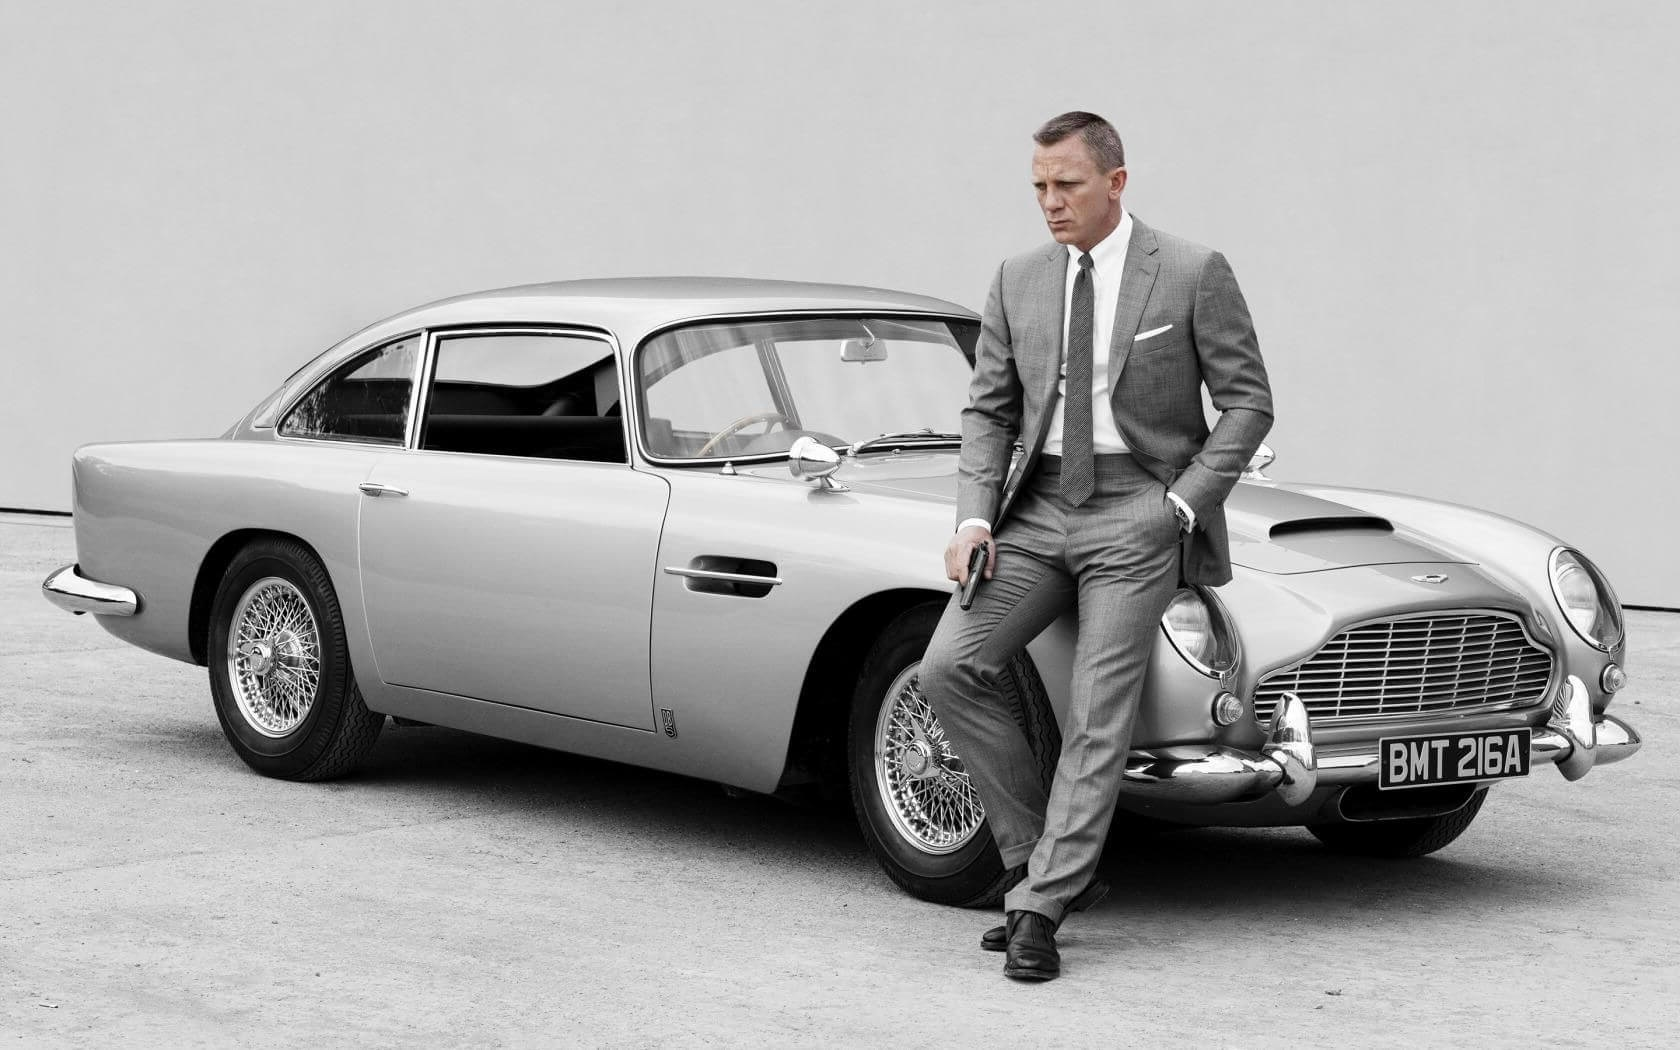 Forza Horizon 4 Fahren Wie 007 Dlc Mit James Bond Autos